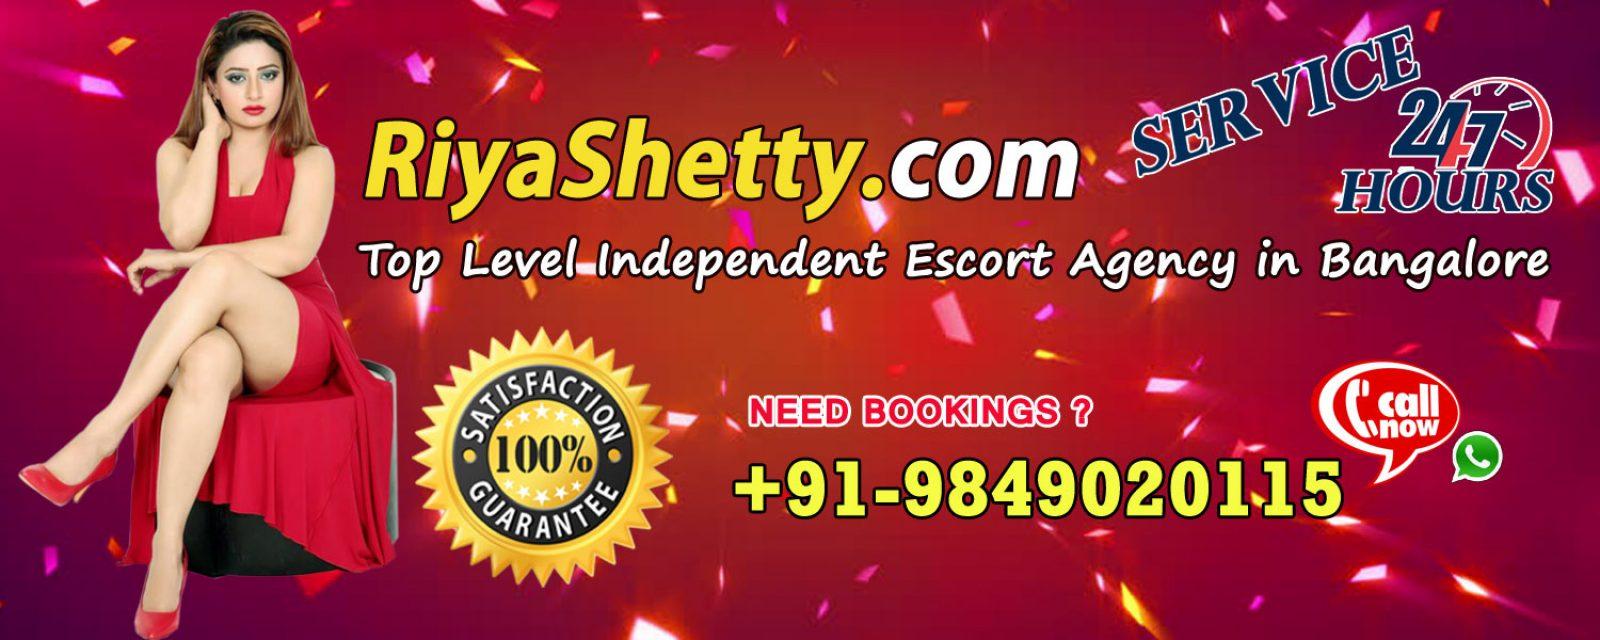 Riya Shetty Independent Bangalore Escorts at Your Service 24/7 Outcalls